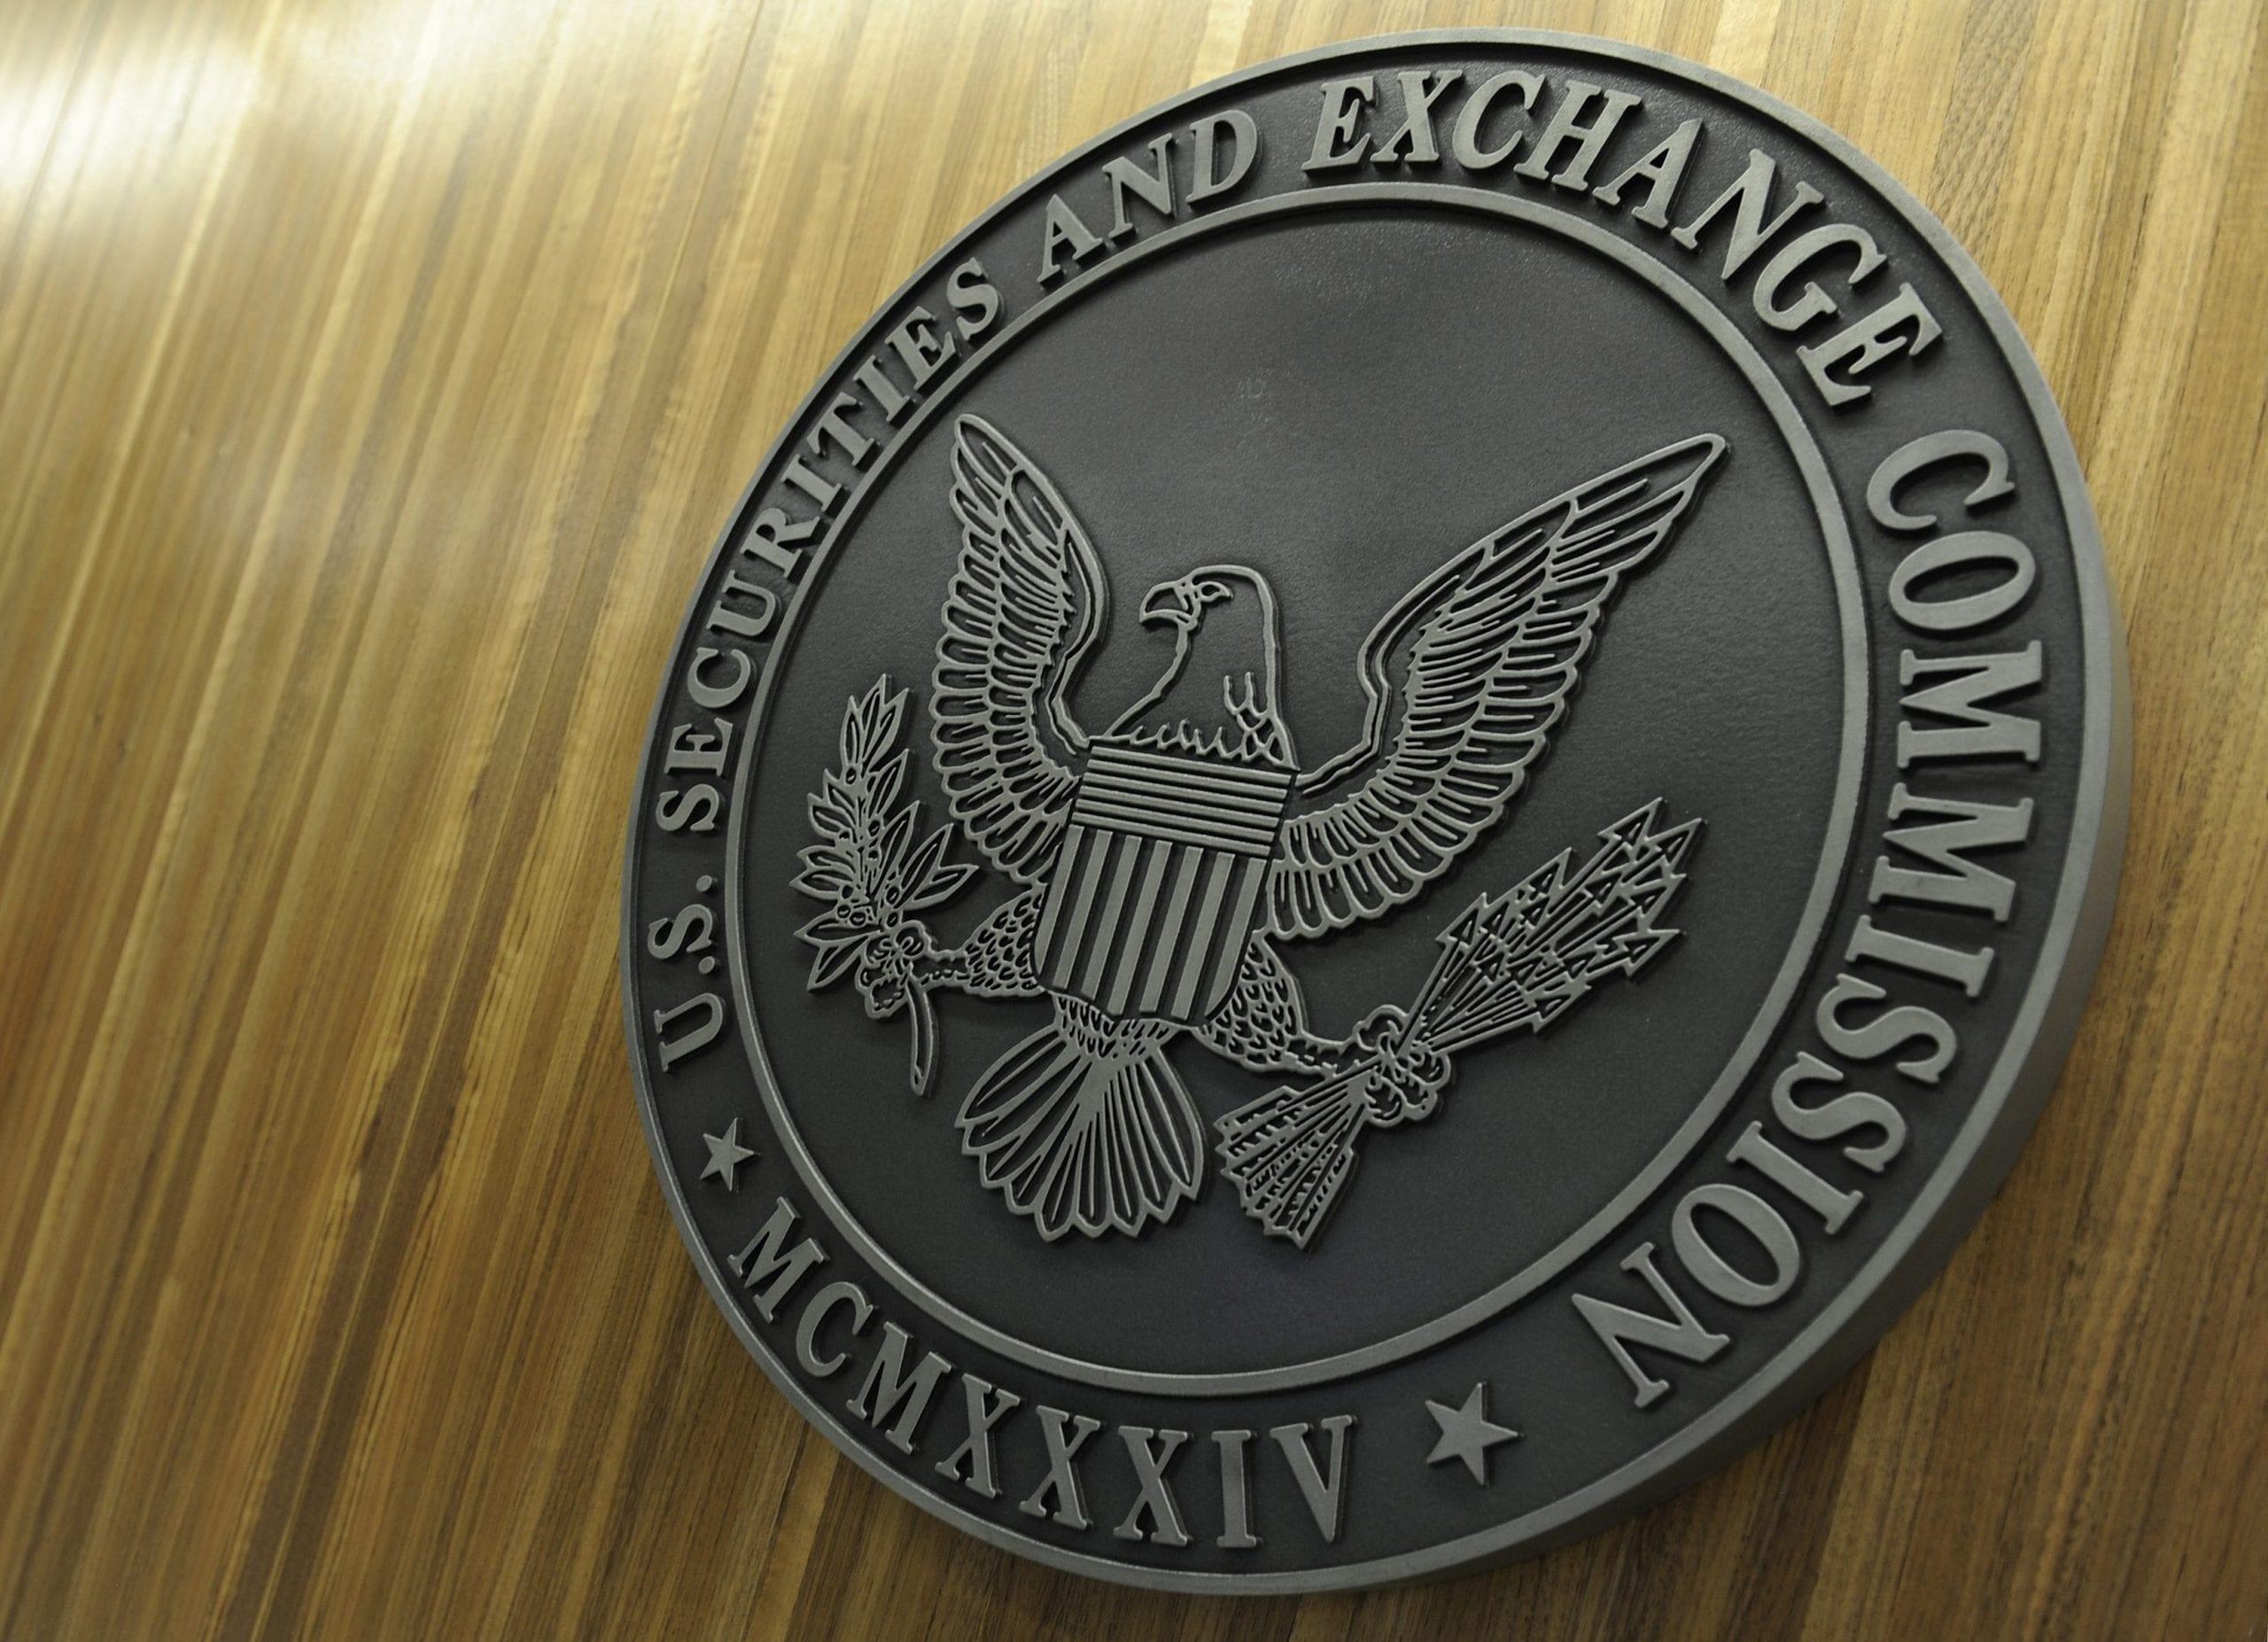 SEC seal in Washington